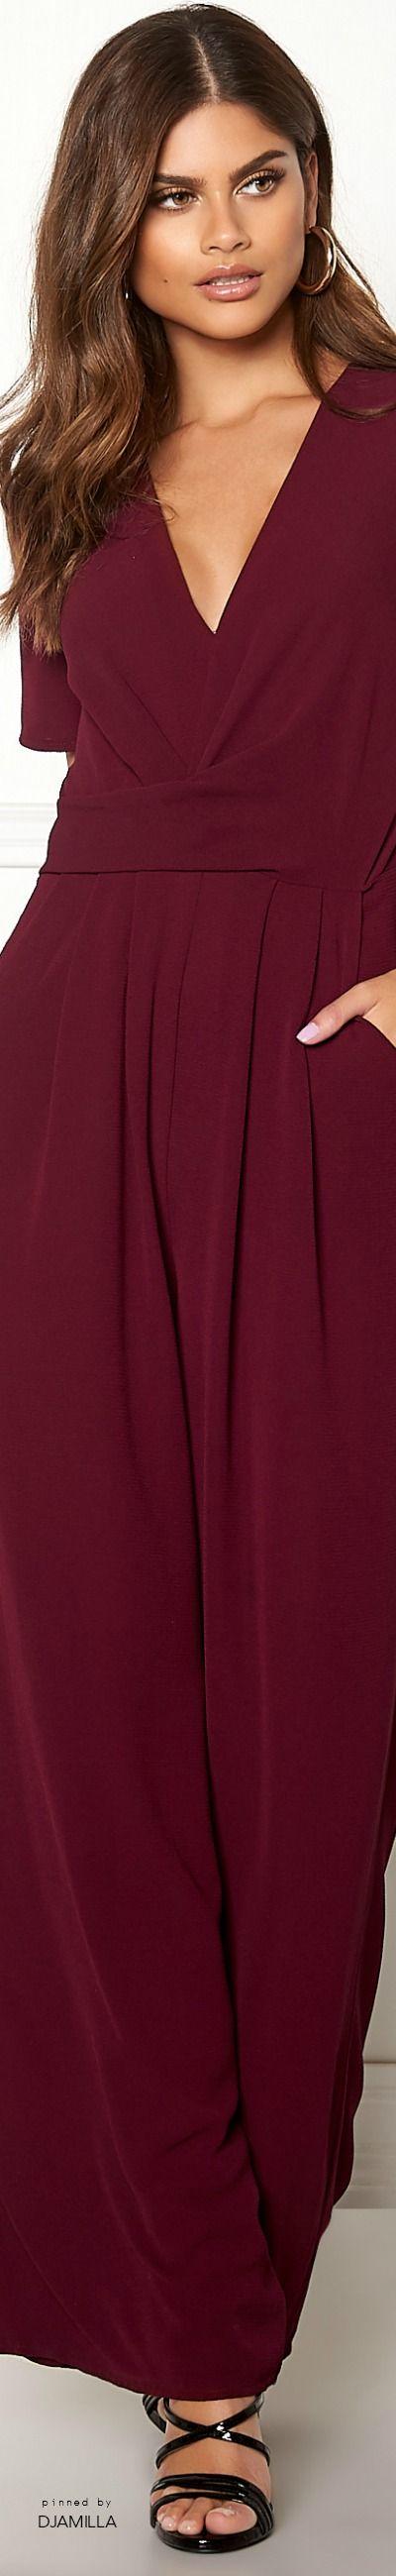 Make Way Harlee Jumpsuit Wine Red Fashion Shades Of Burgundy Glamour